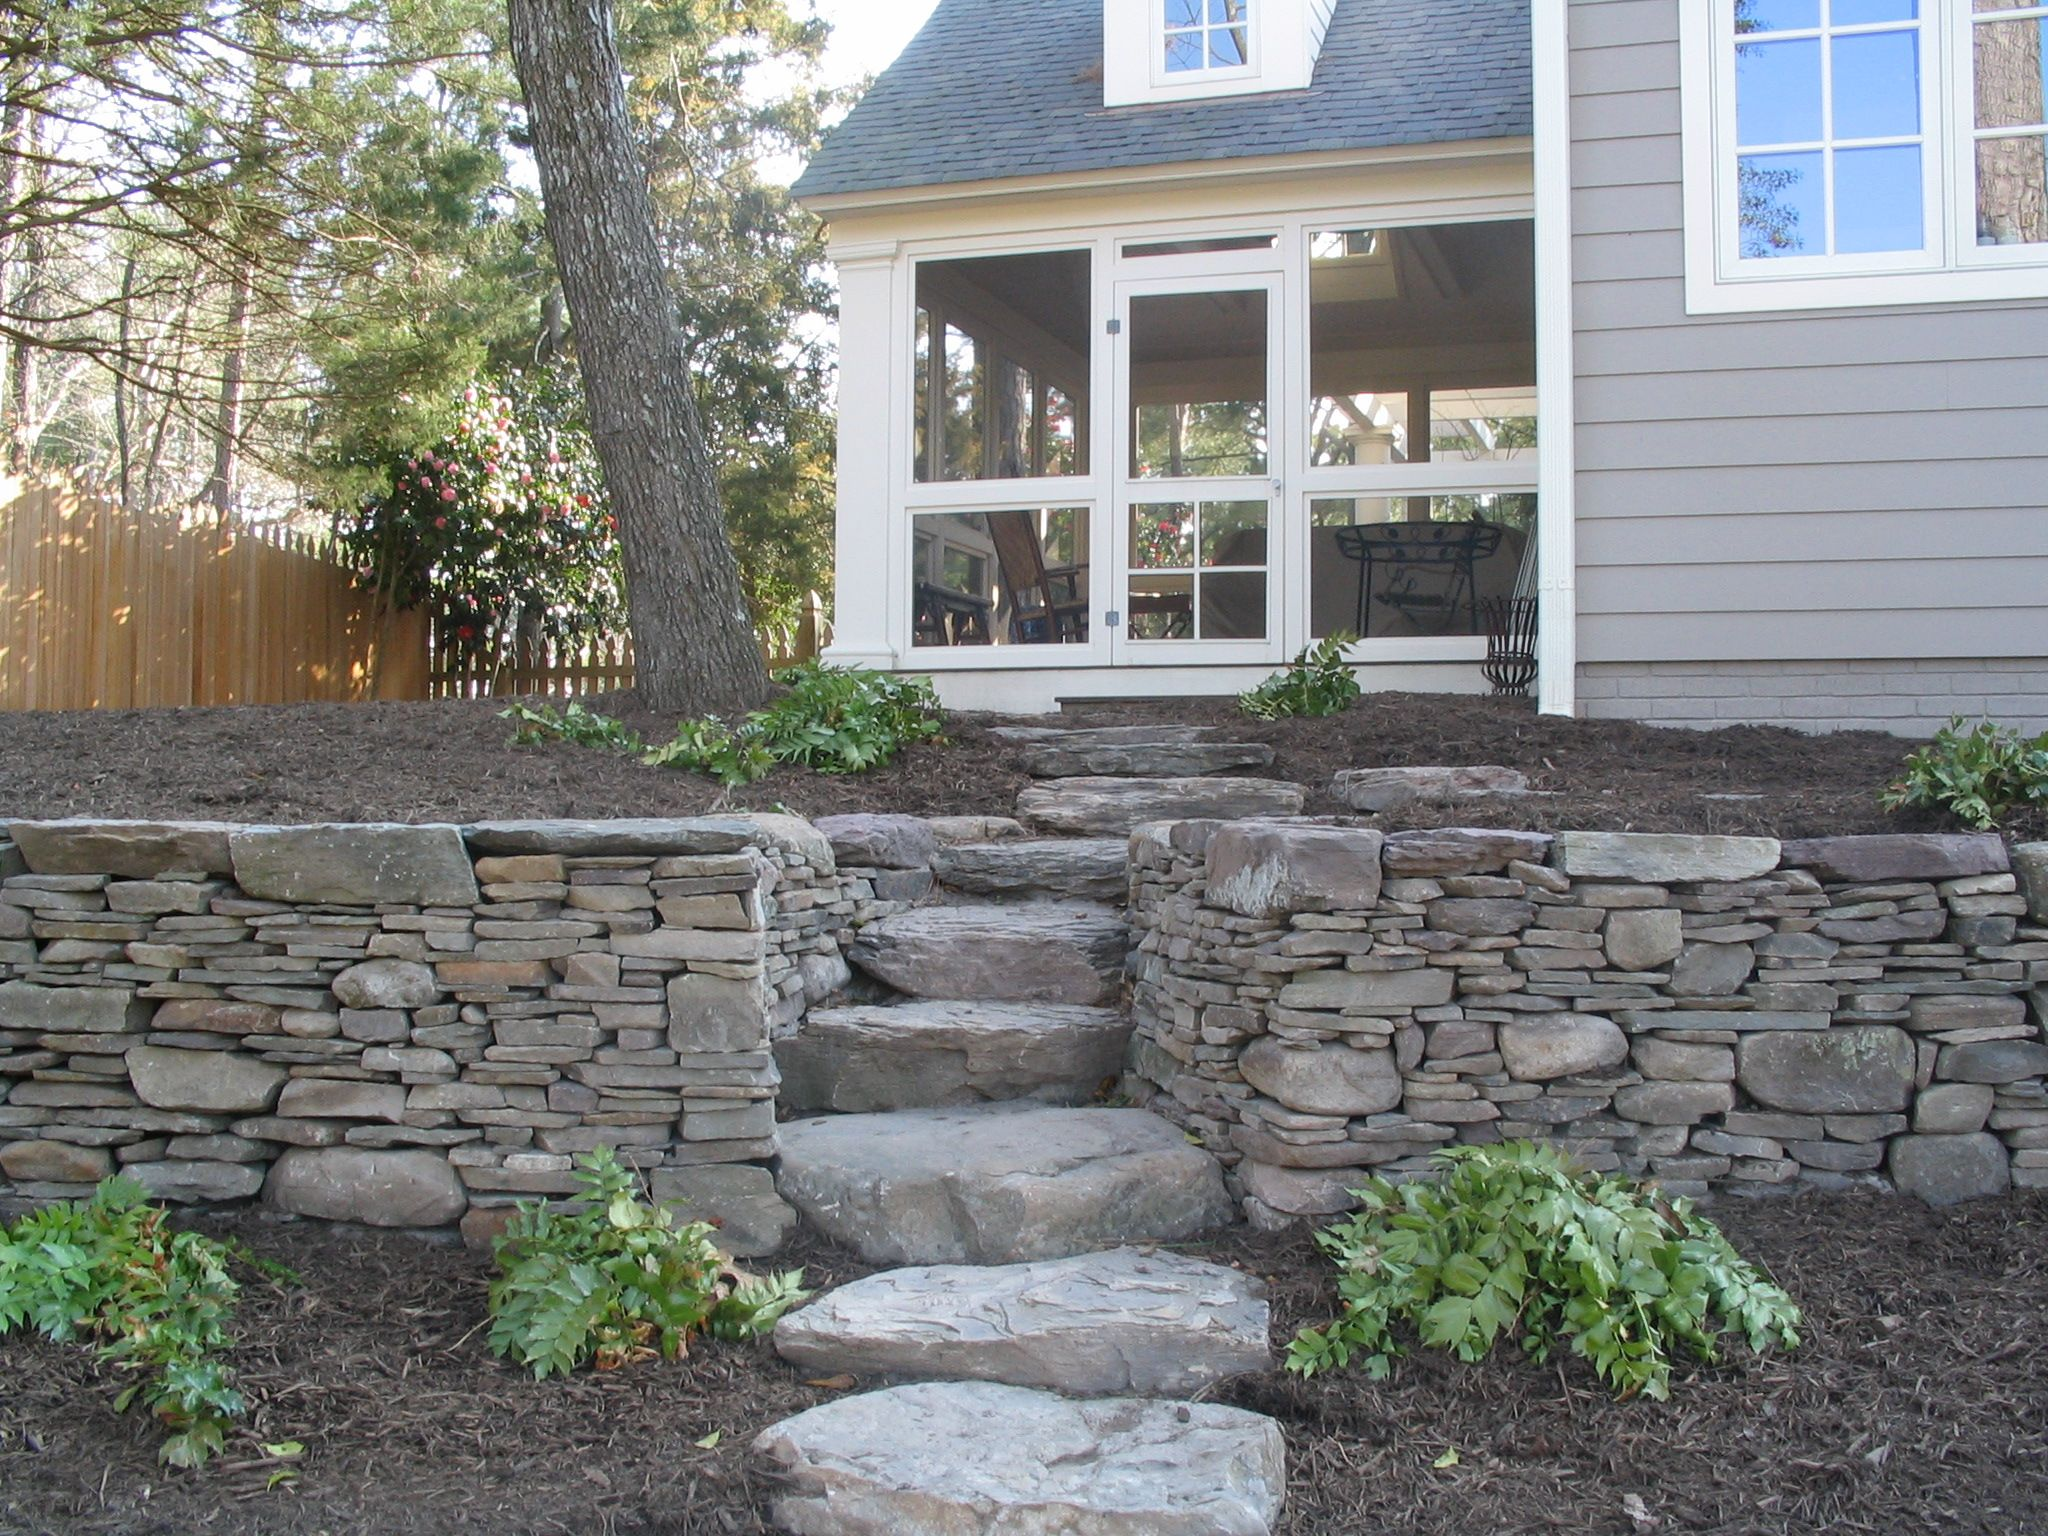 Pin By Cynthia Brown On Stone Walls Retaining Wall Patio Stones Stone Retaining Wall